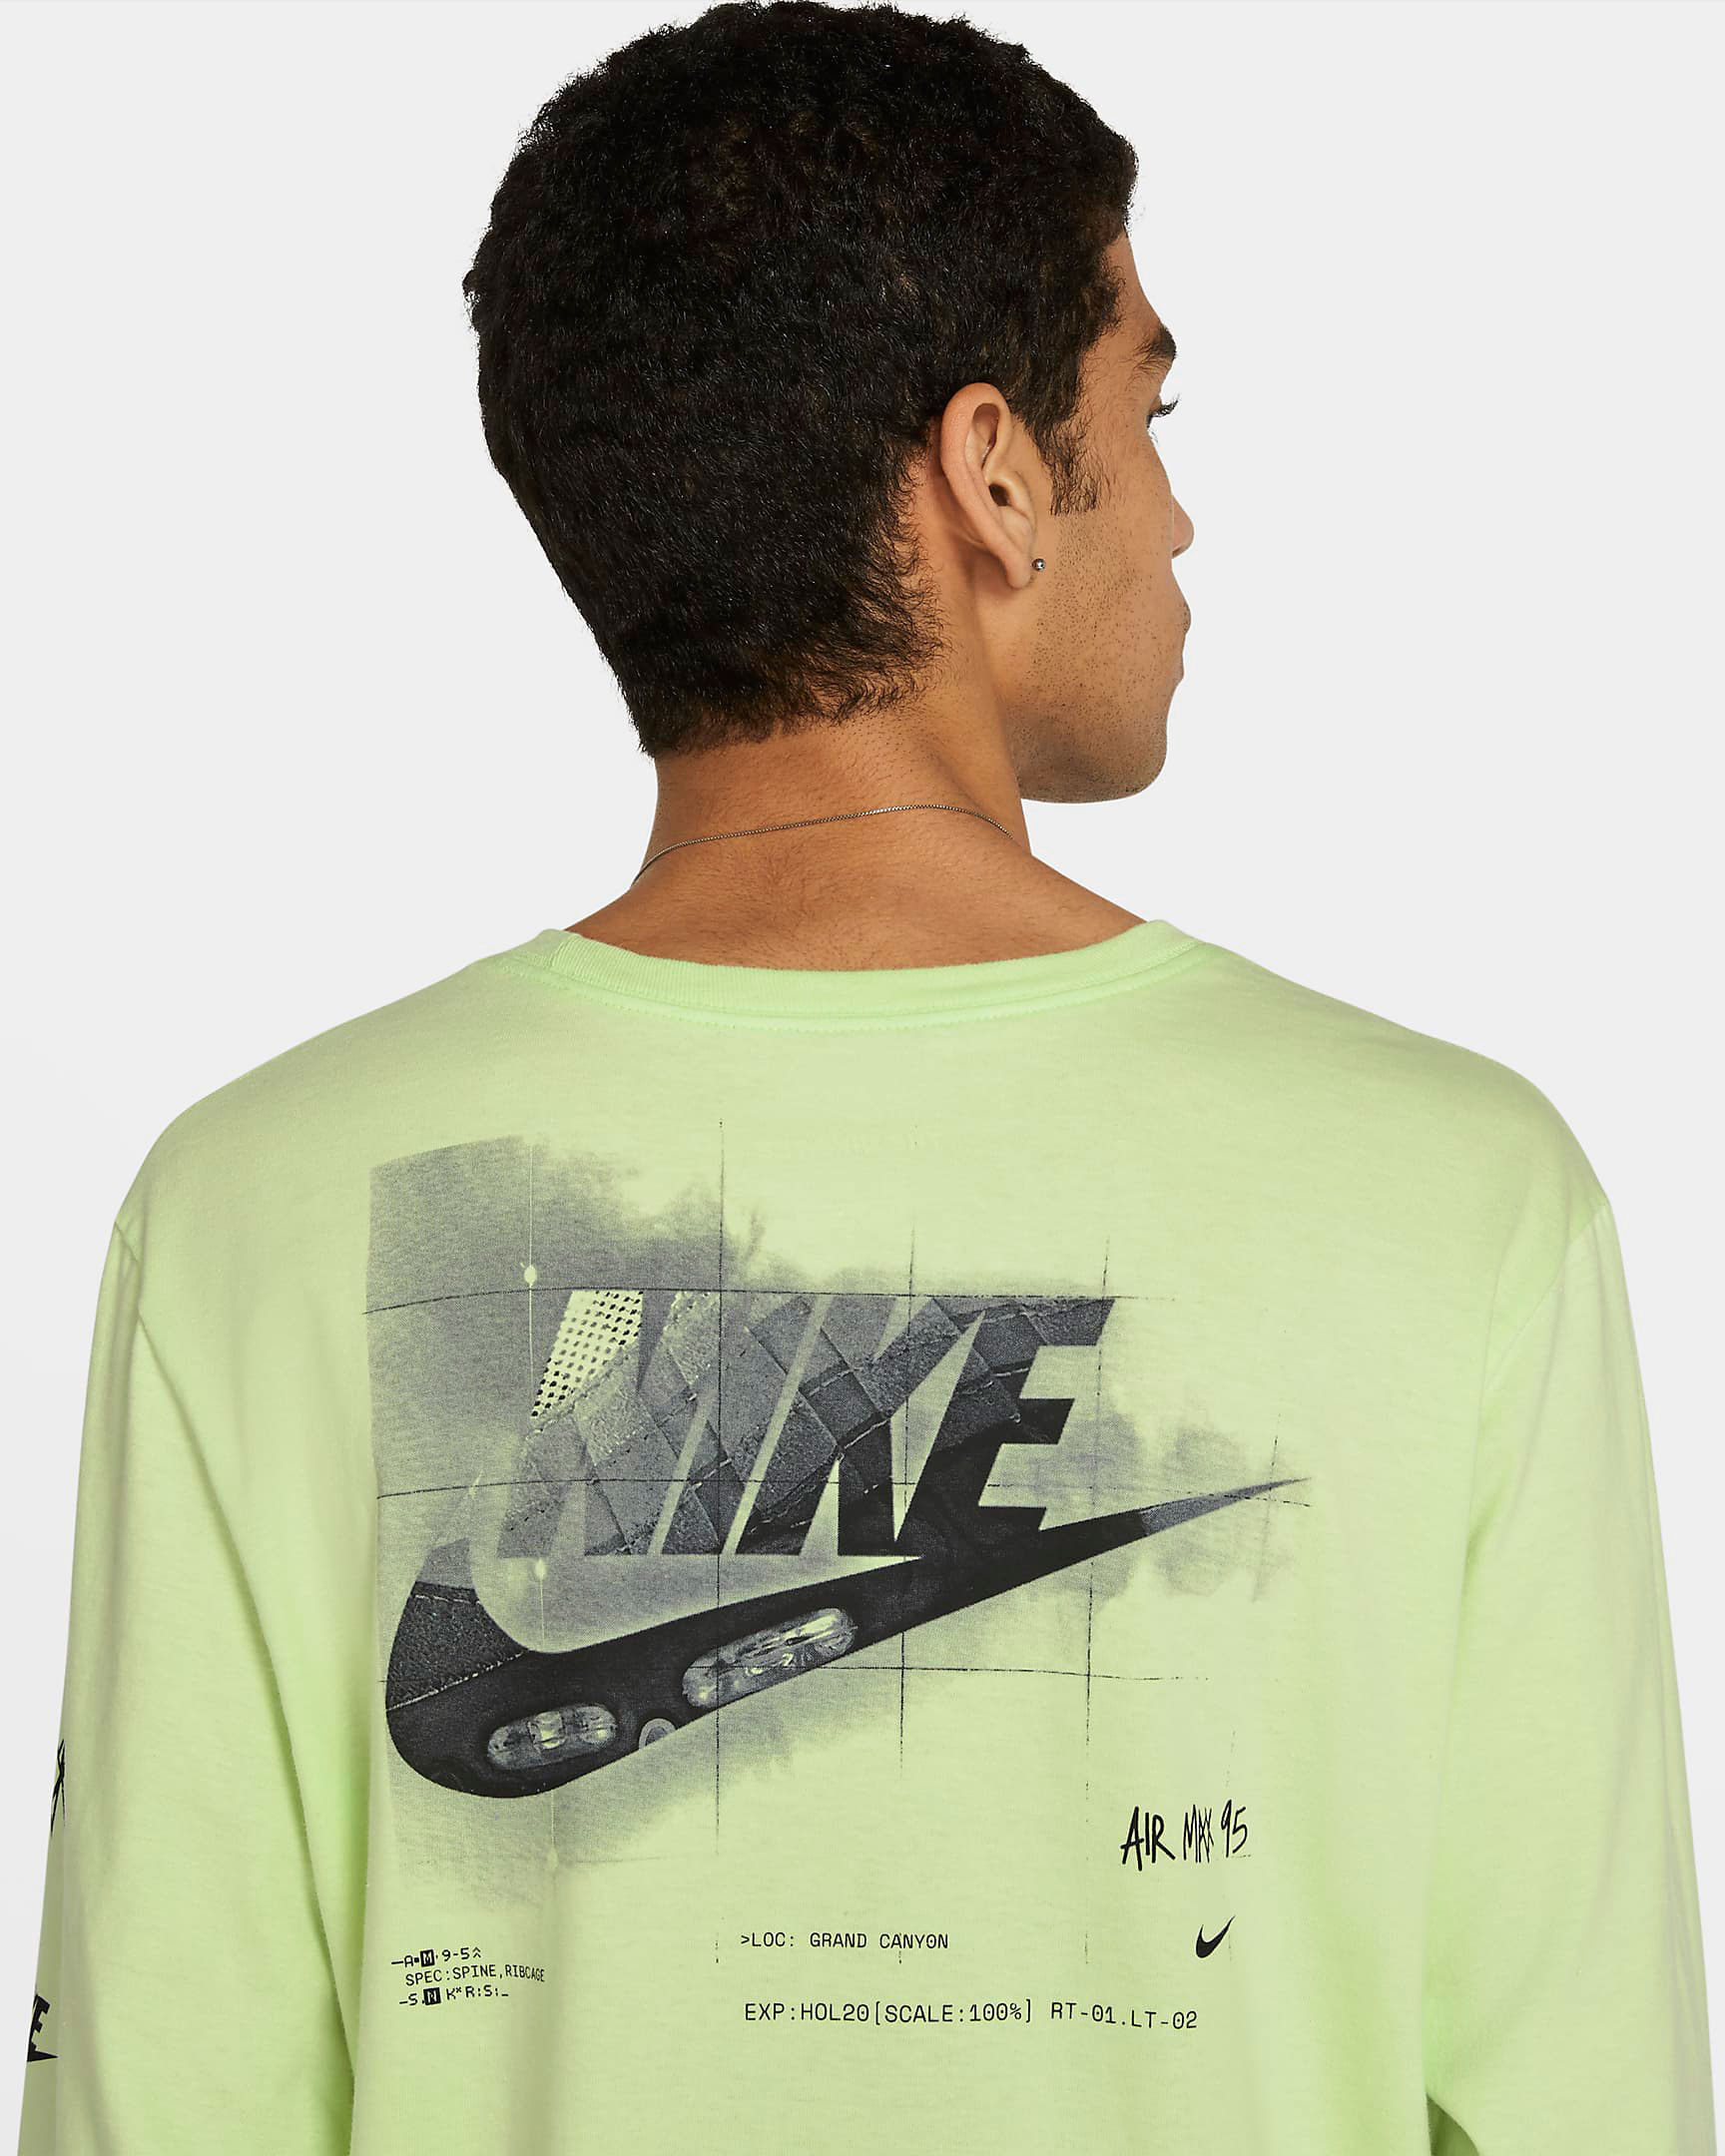 nike-air-max-95-neon-2020-long-sleeve-shirt-4